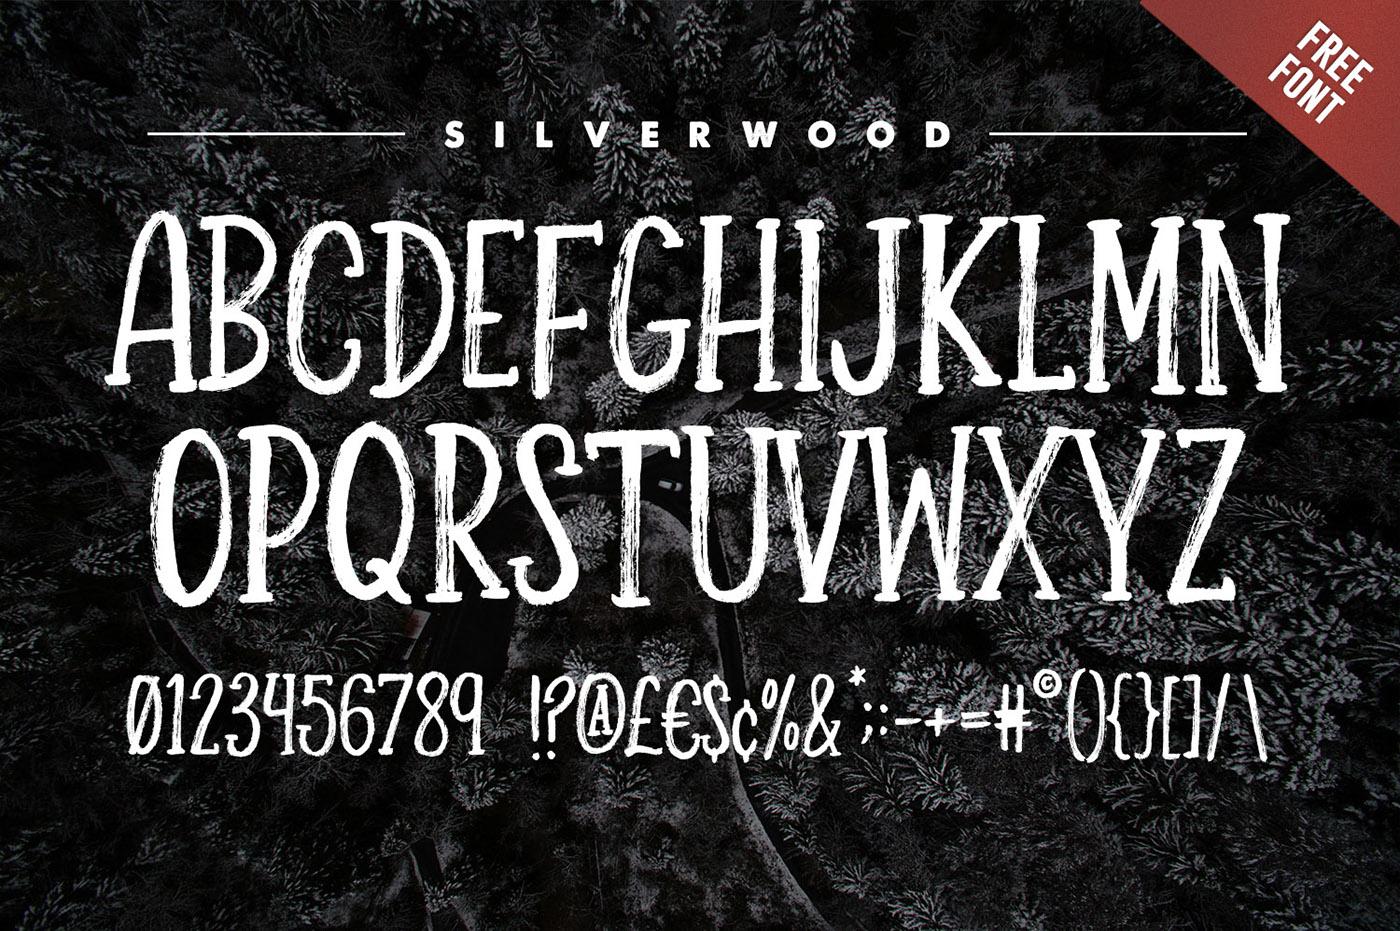 silverwood-typeface-1